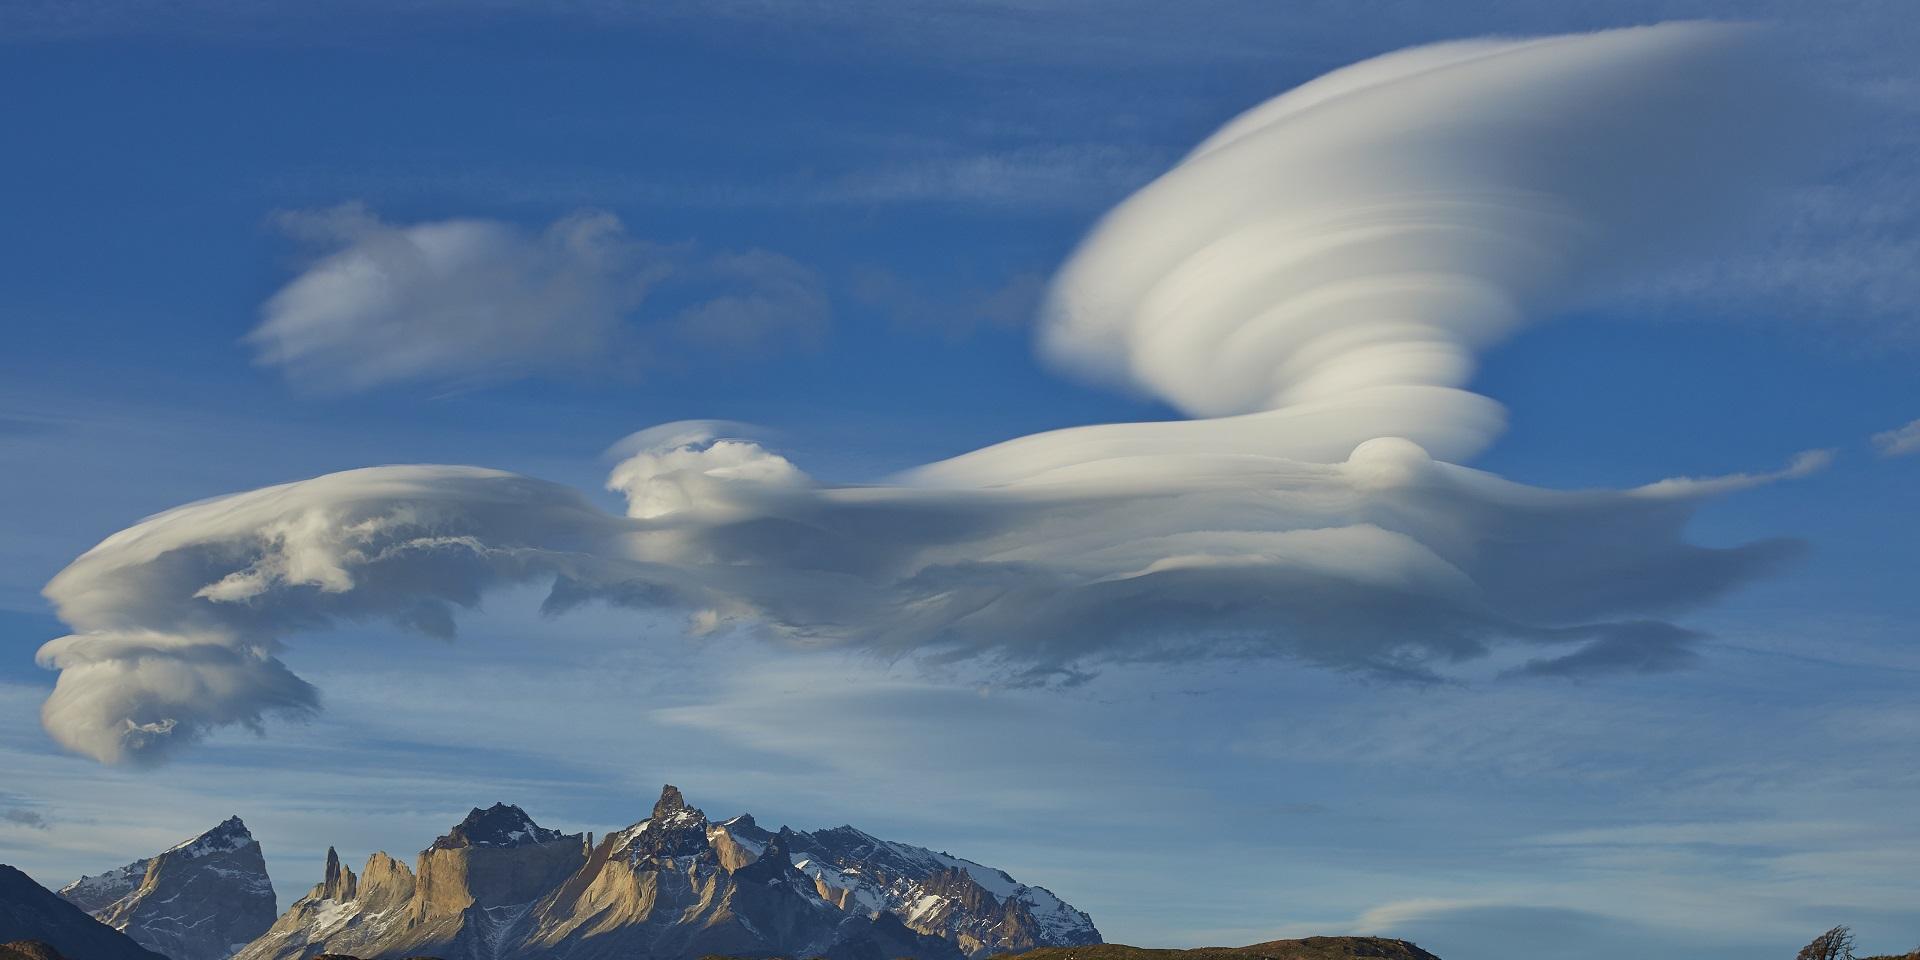 lenticular clouds met office